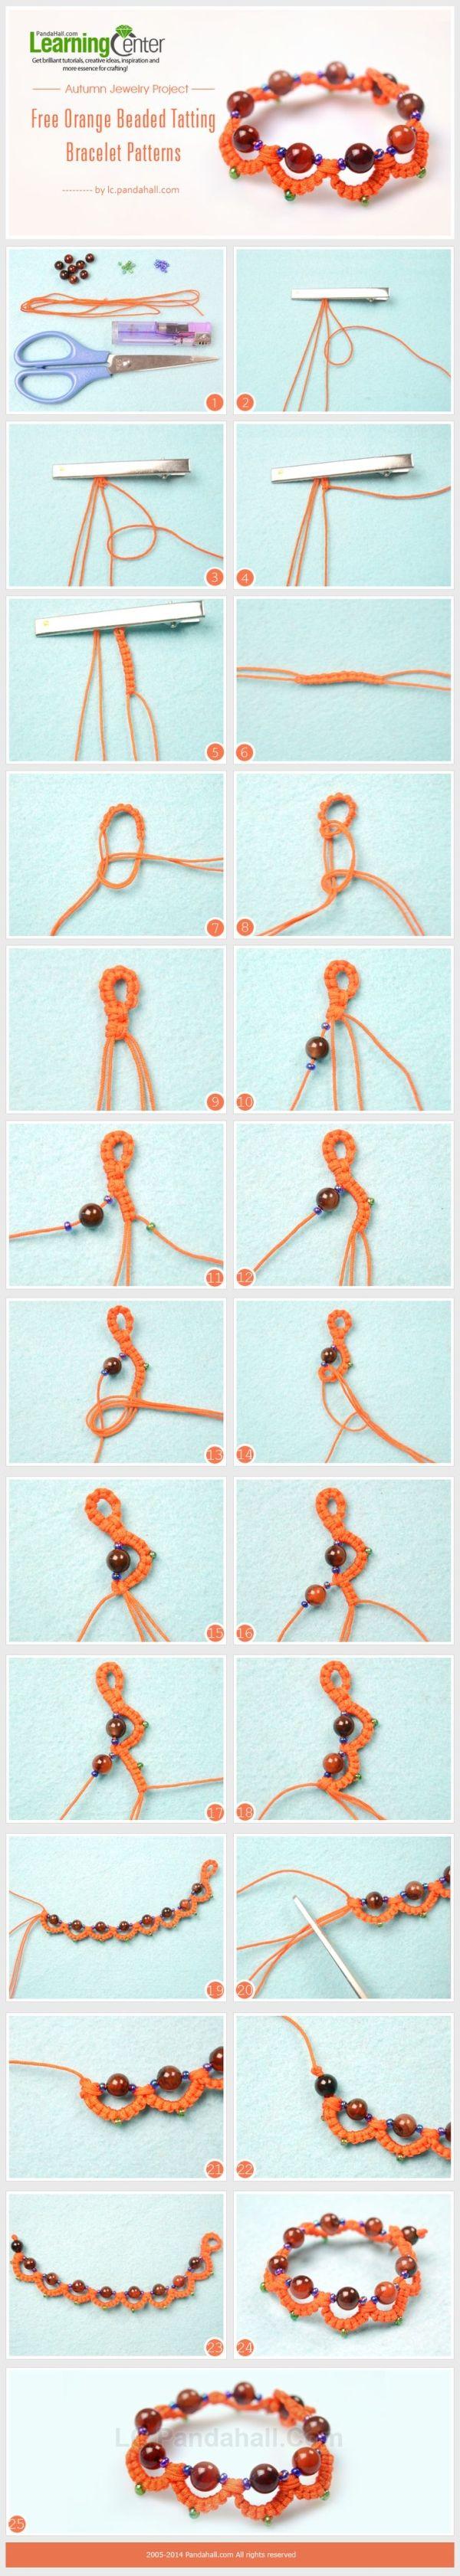 Autumn Jewelry Project- Free Orange Beaded Tatting Bracelet Patterns by wanting